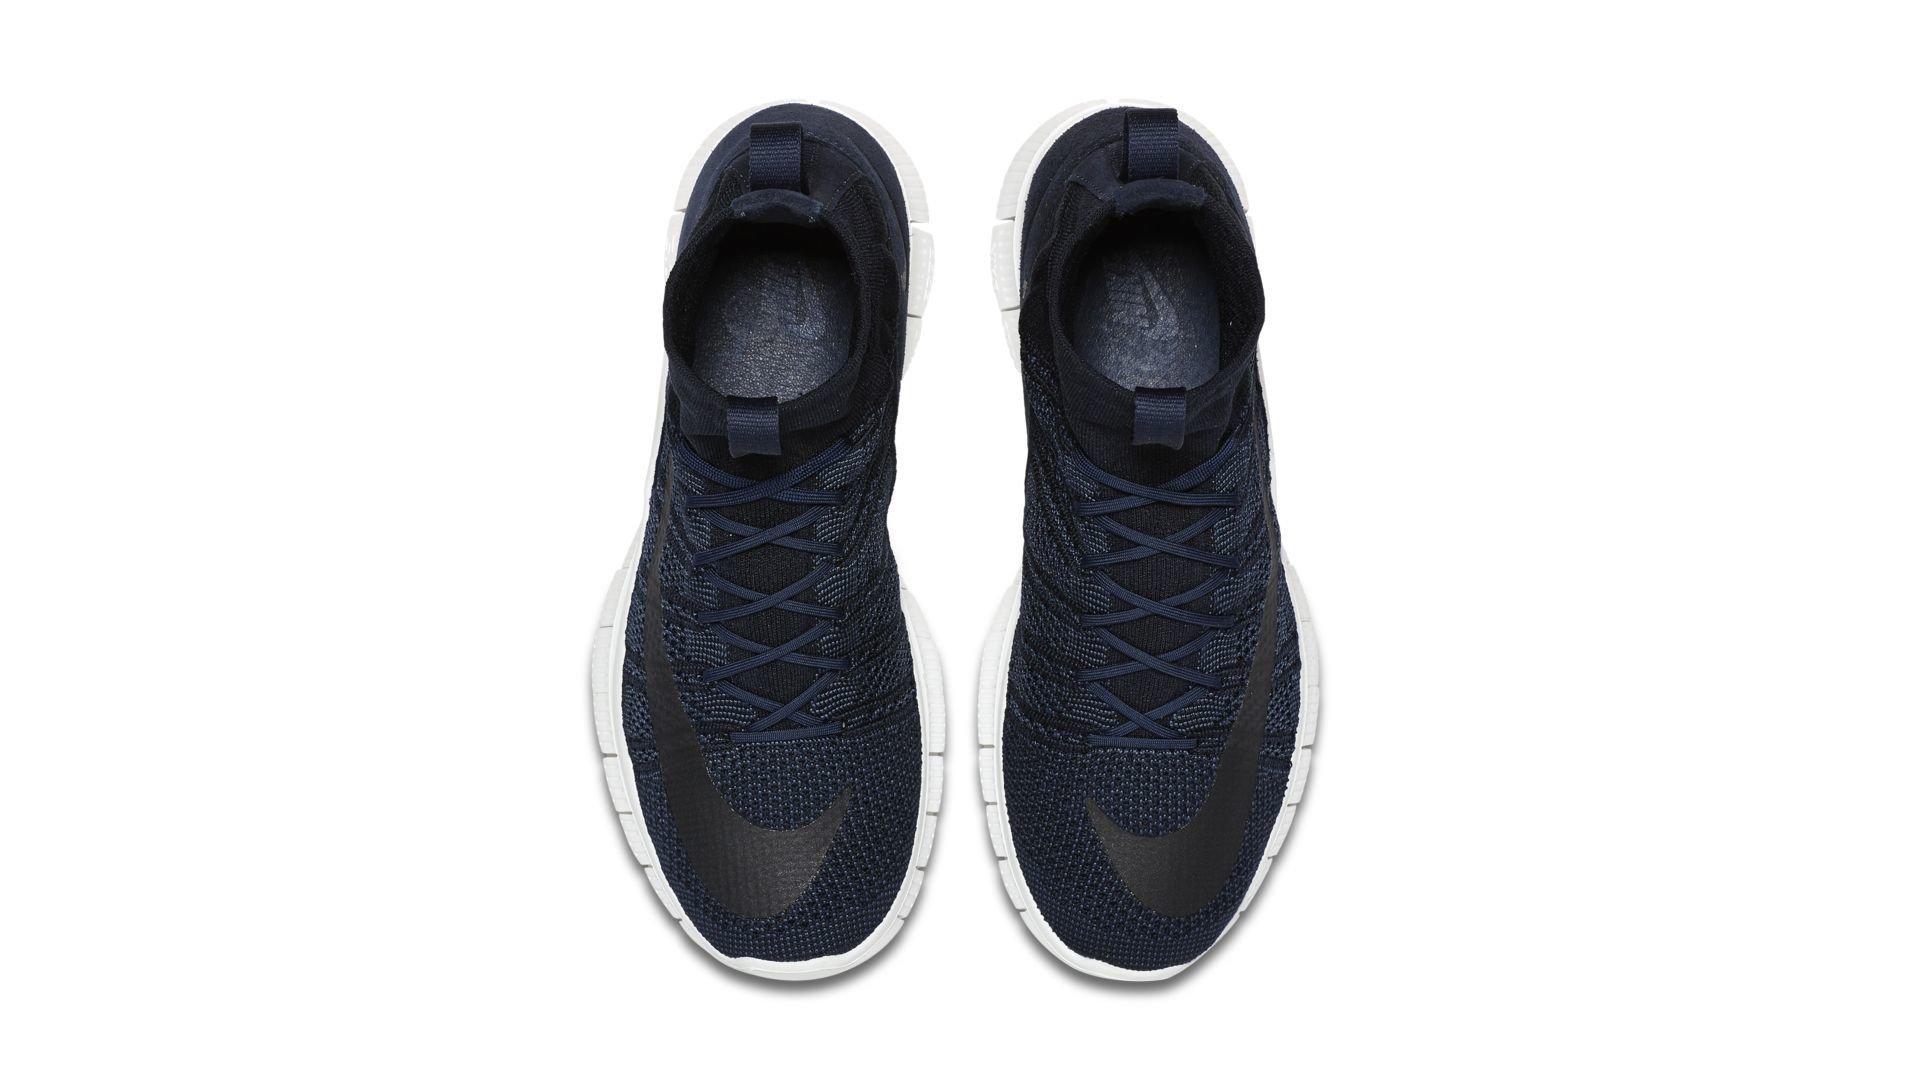 Nike Superfly Mercurial Dark Obsidian (667978-441)